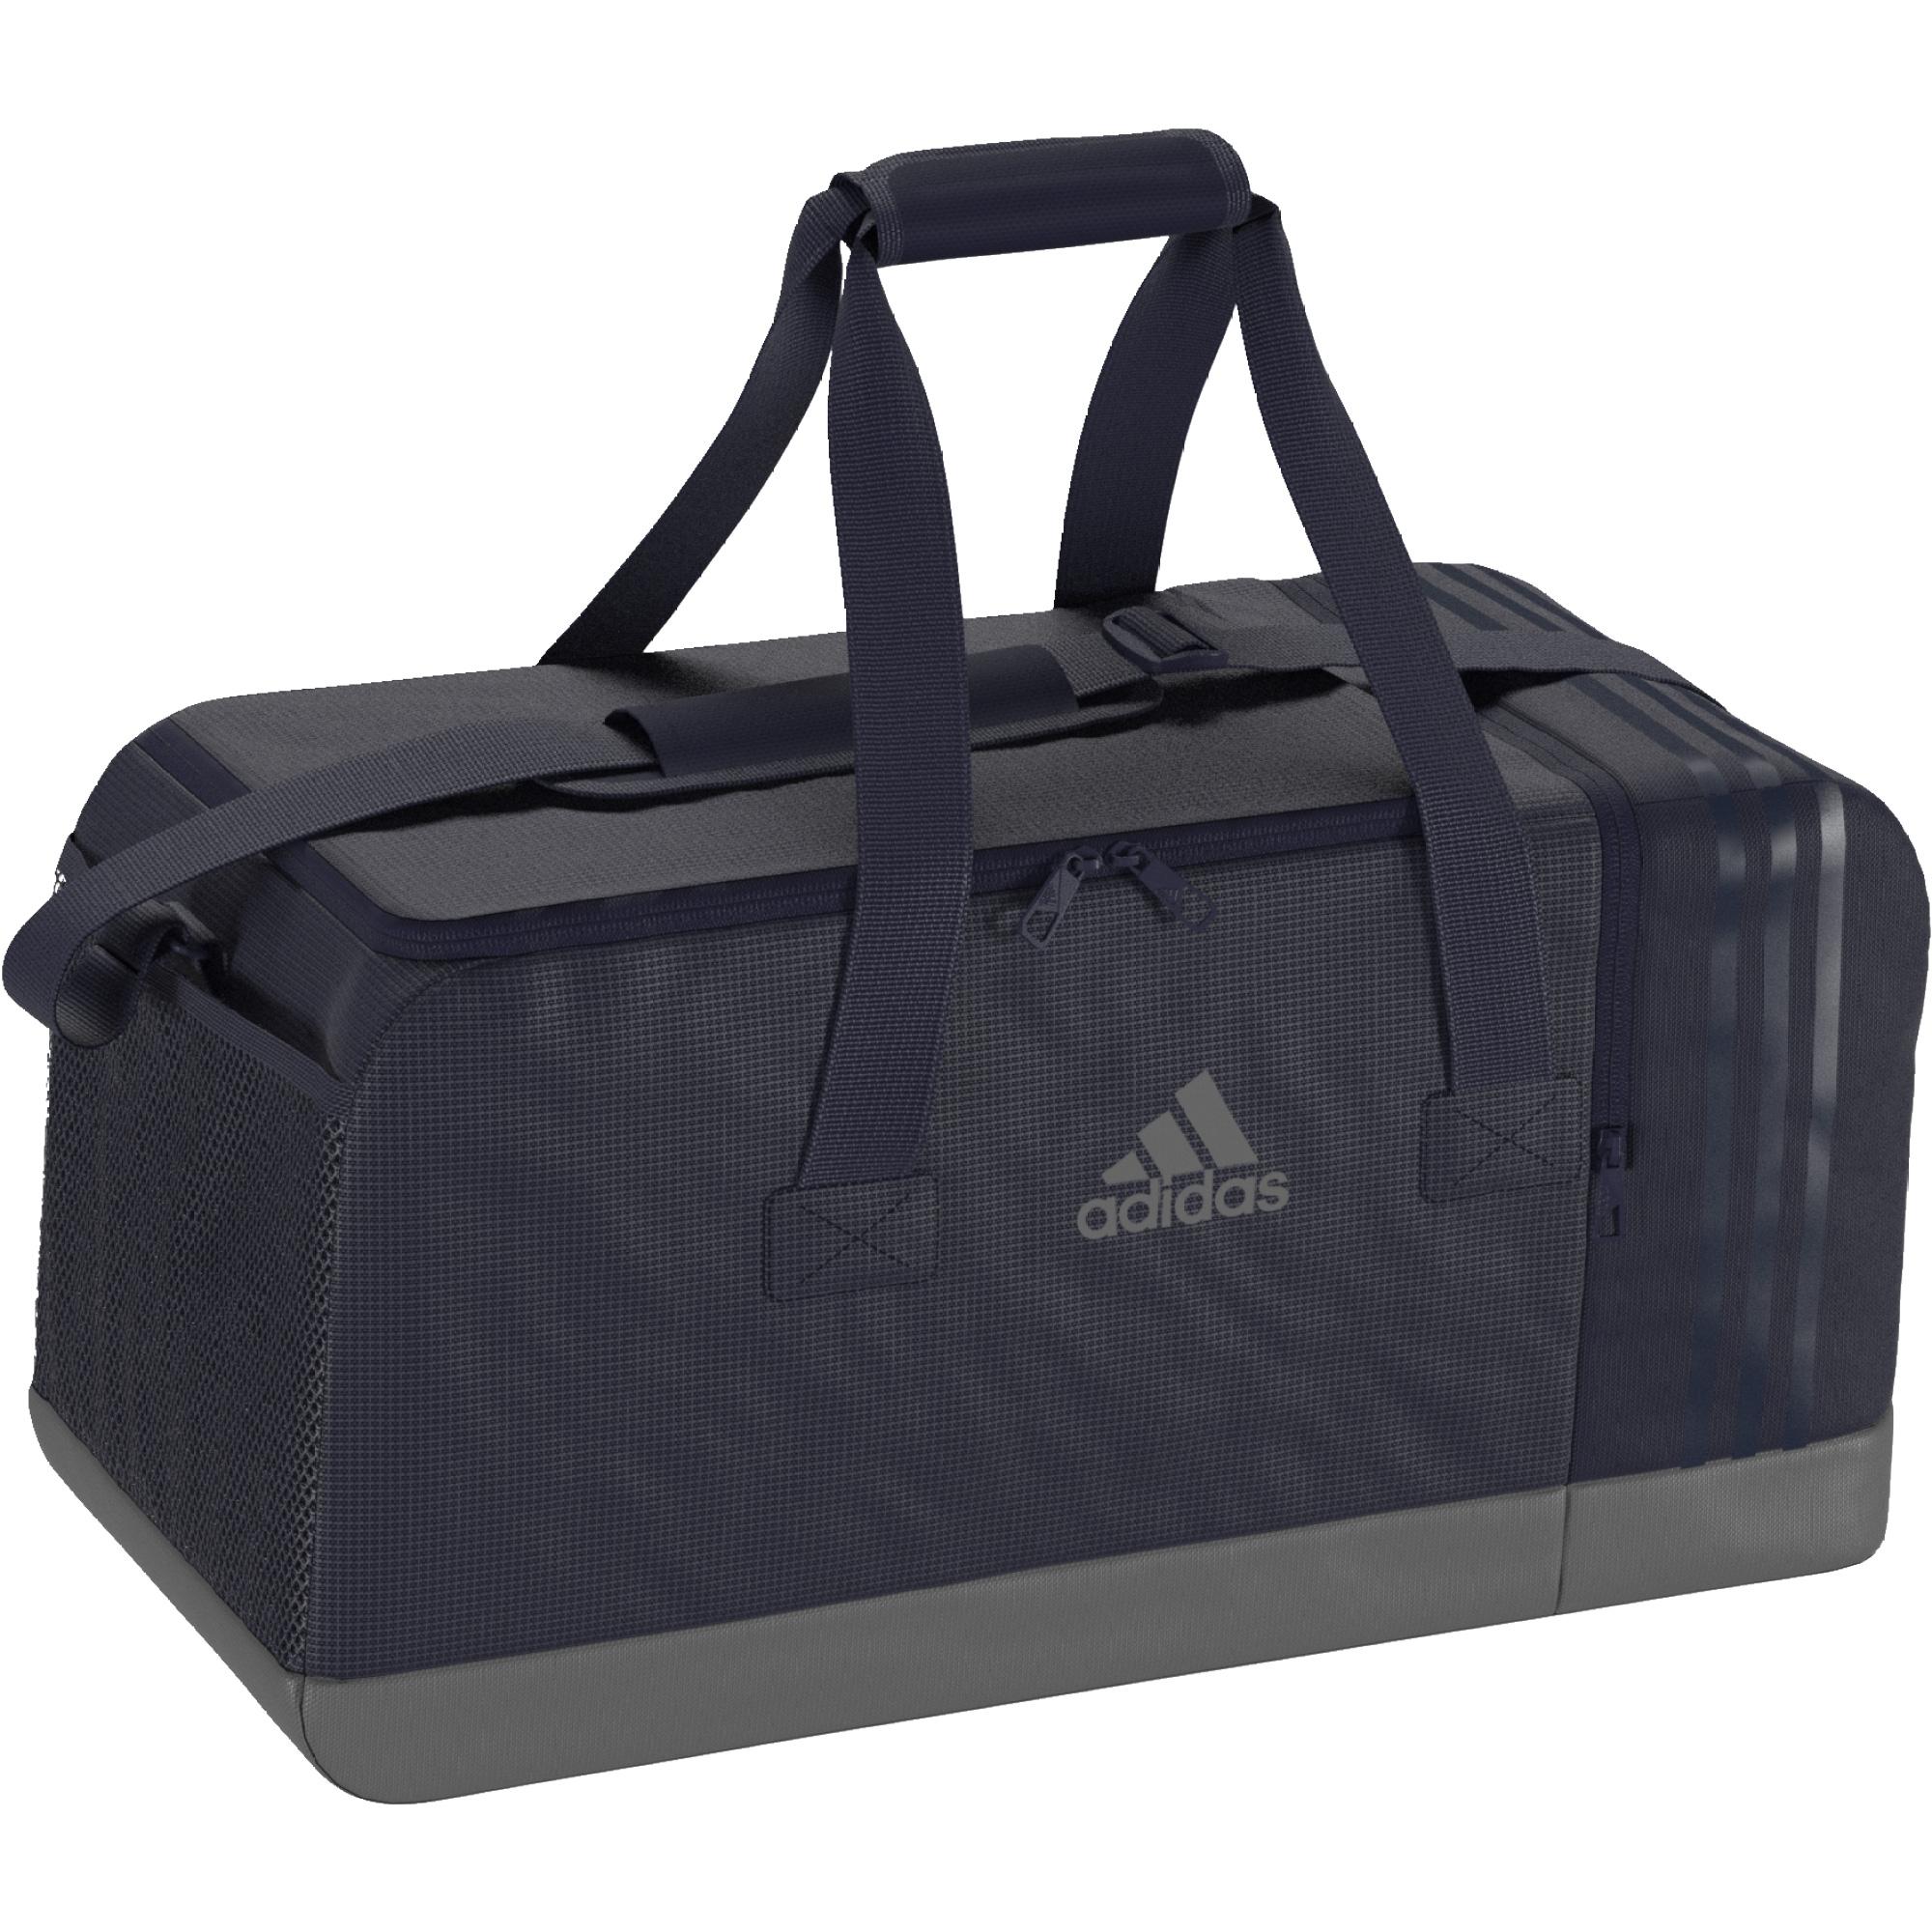 Performance Sport Teambag M Sac 3s De Adidas y6gvI7Ybfm